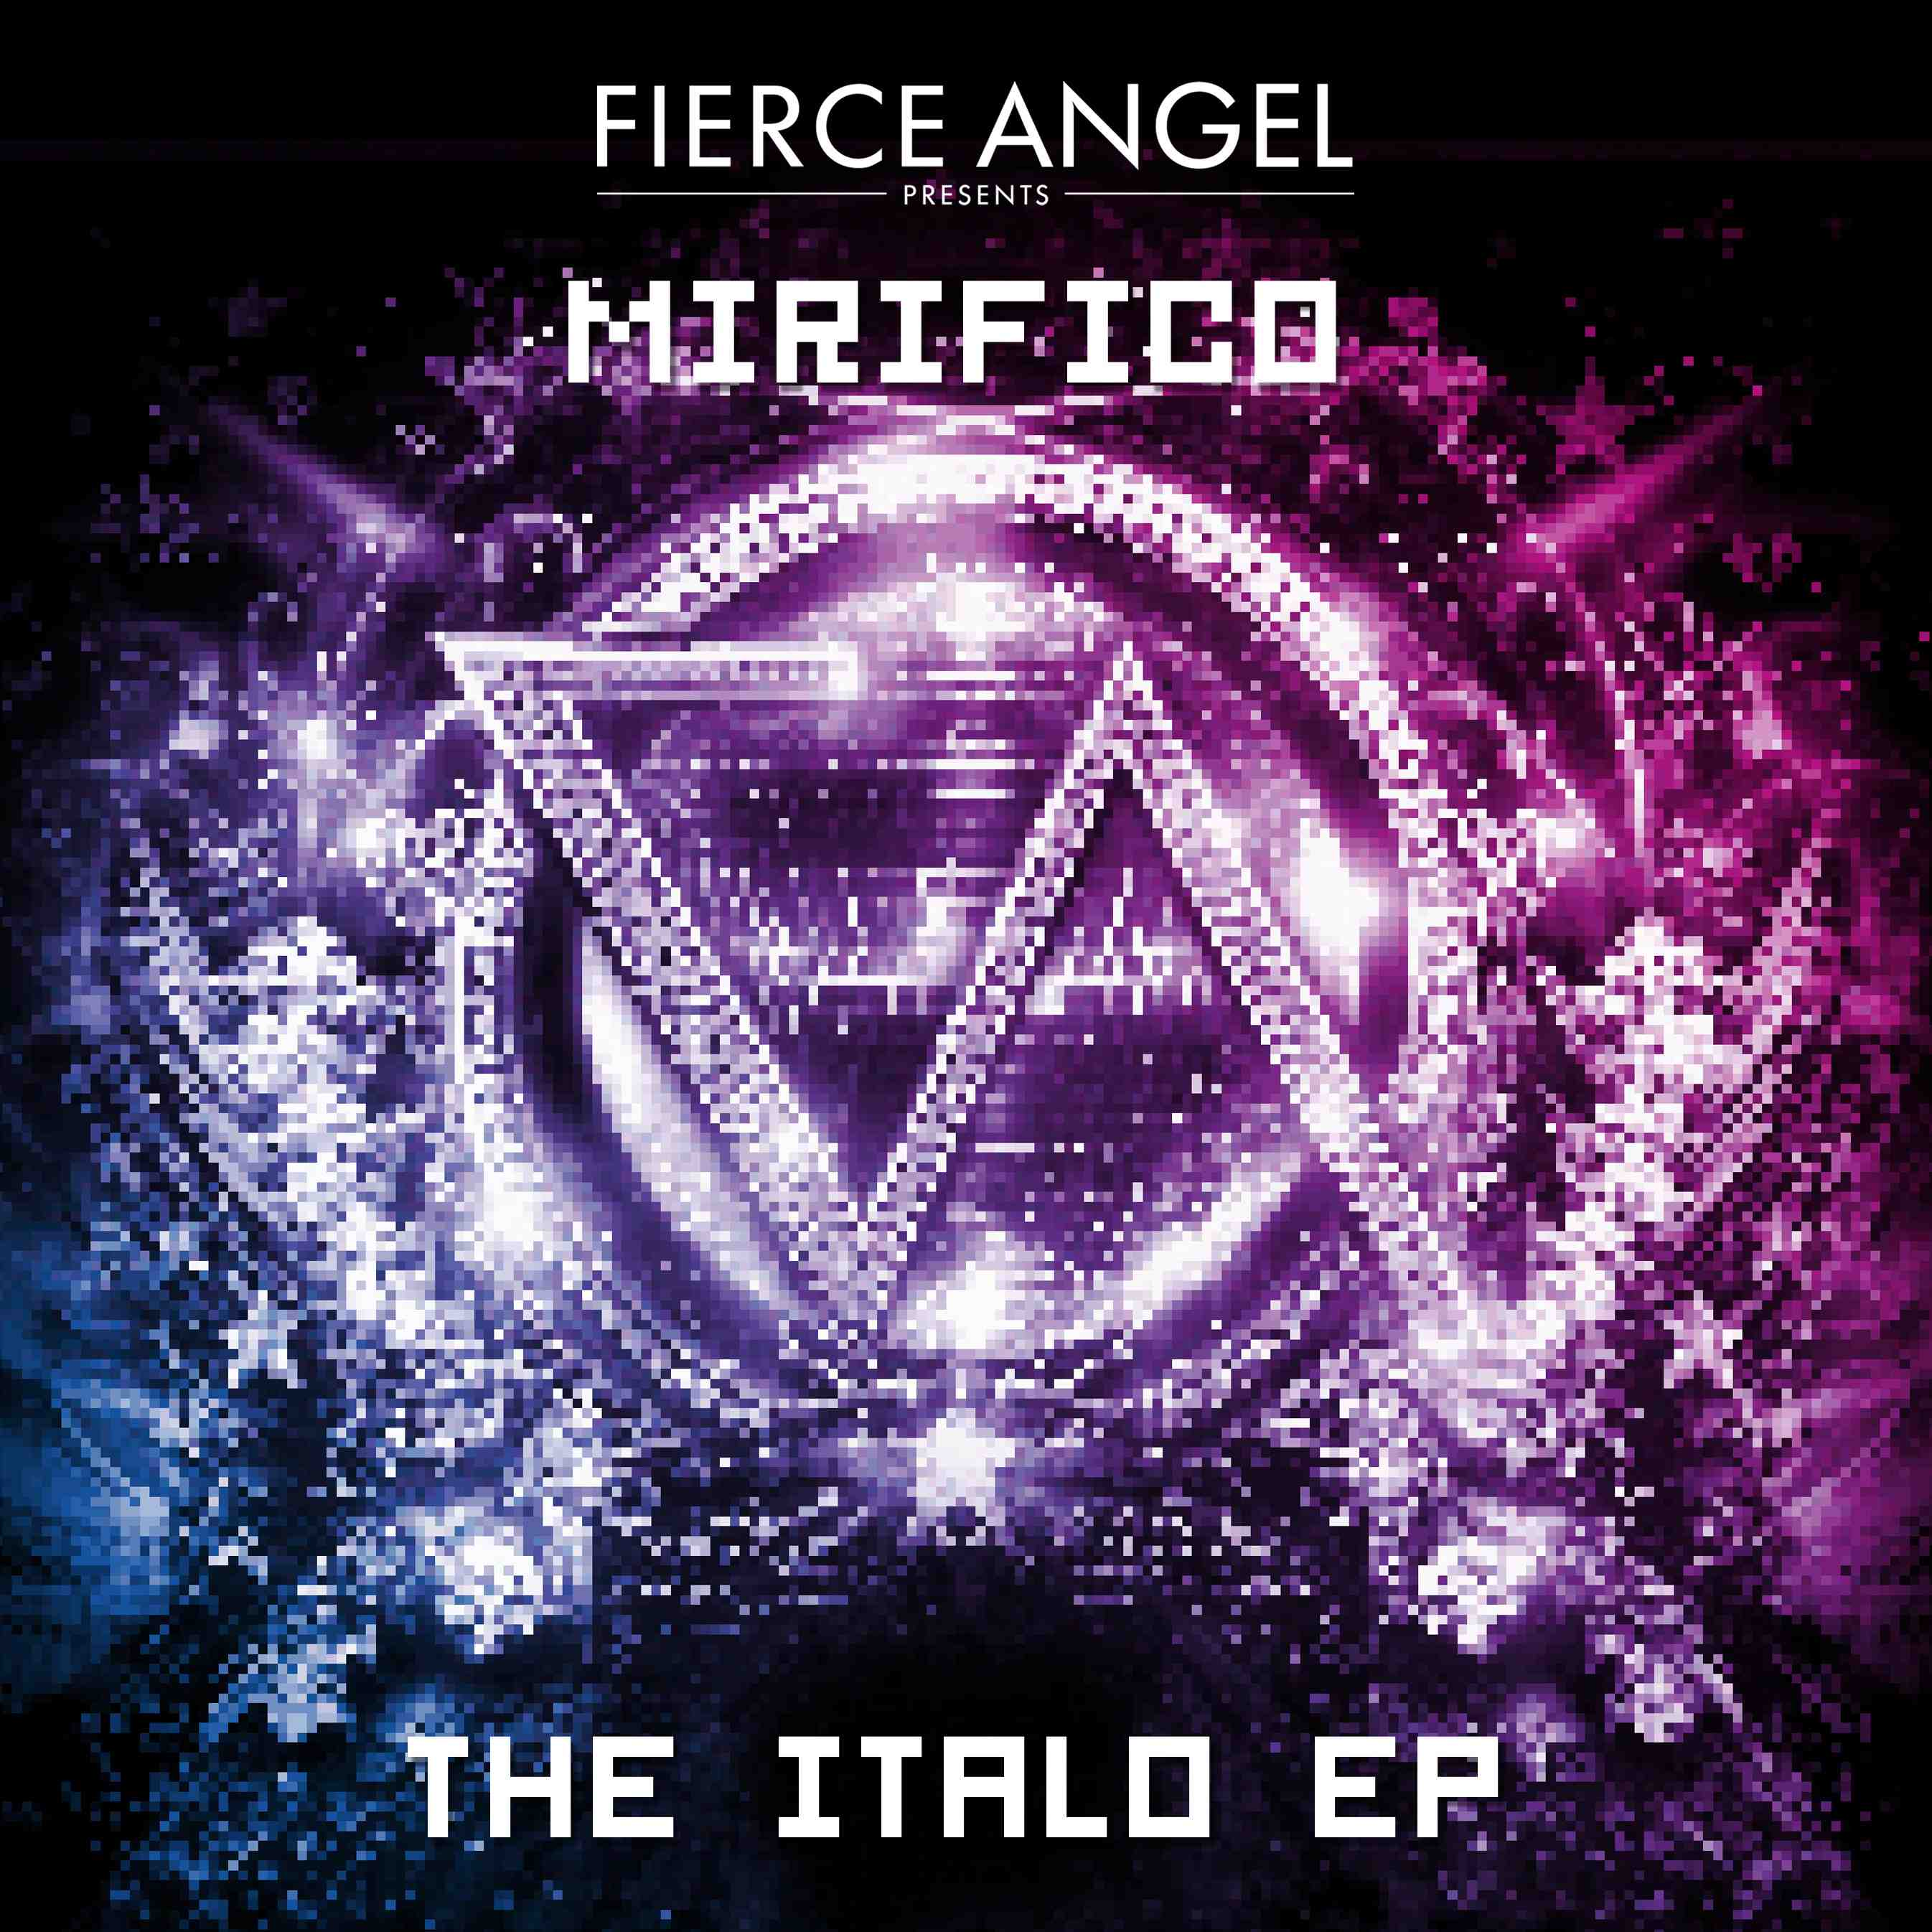 Mirifico - The Italo EP - Fierce Angel